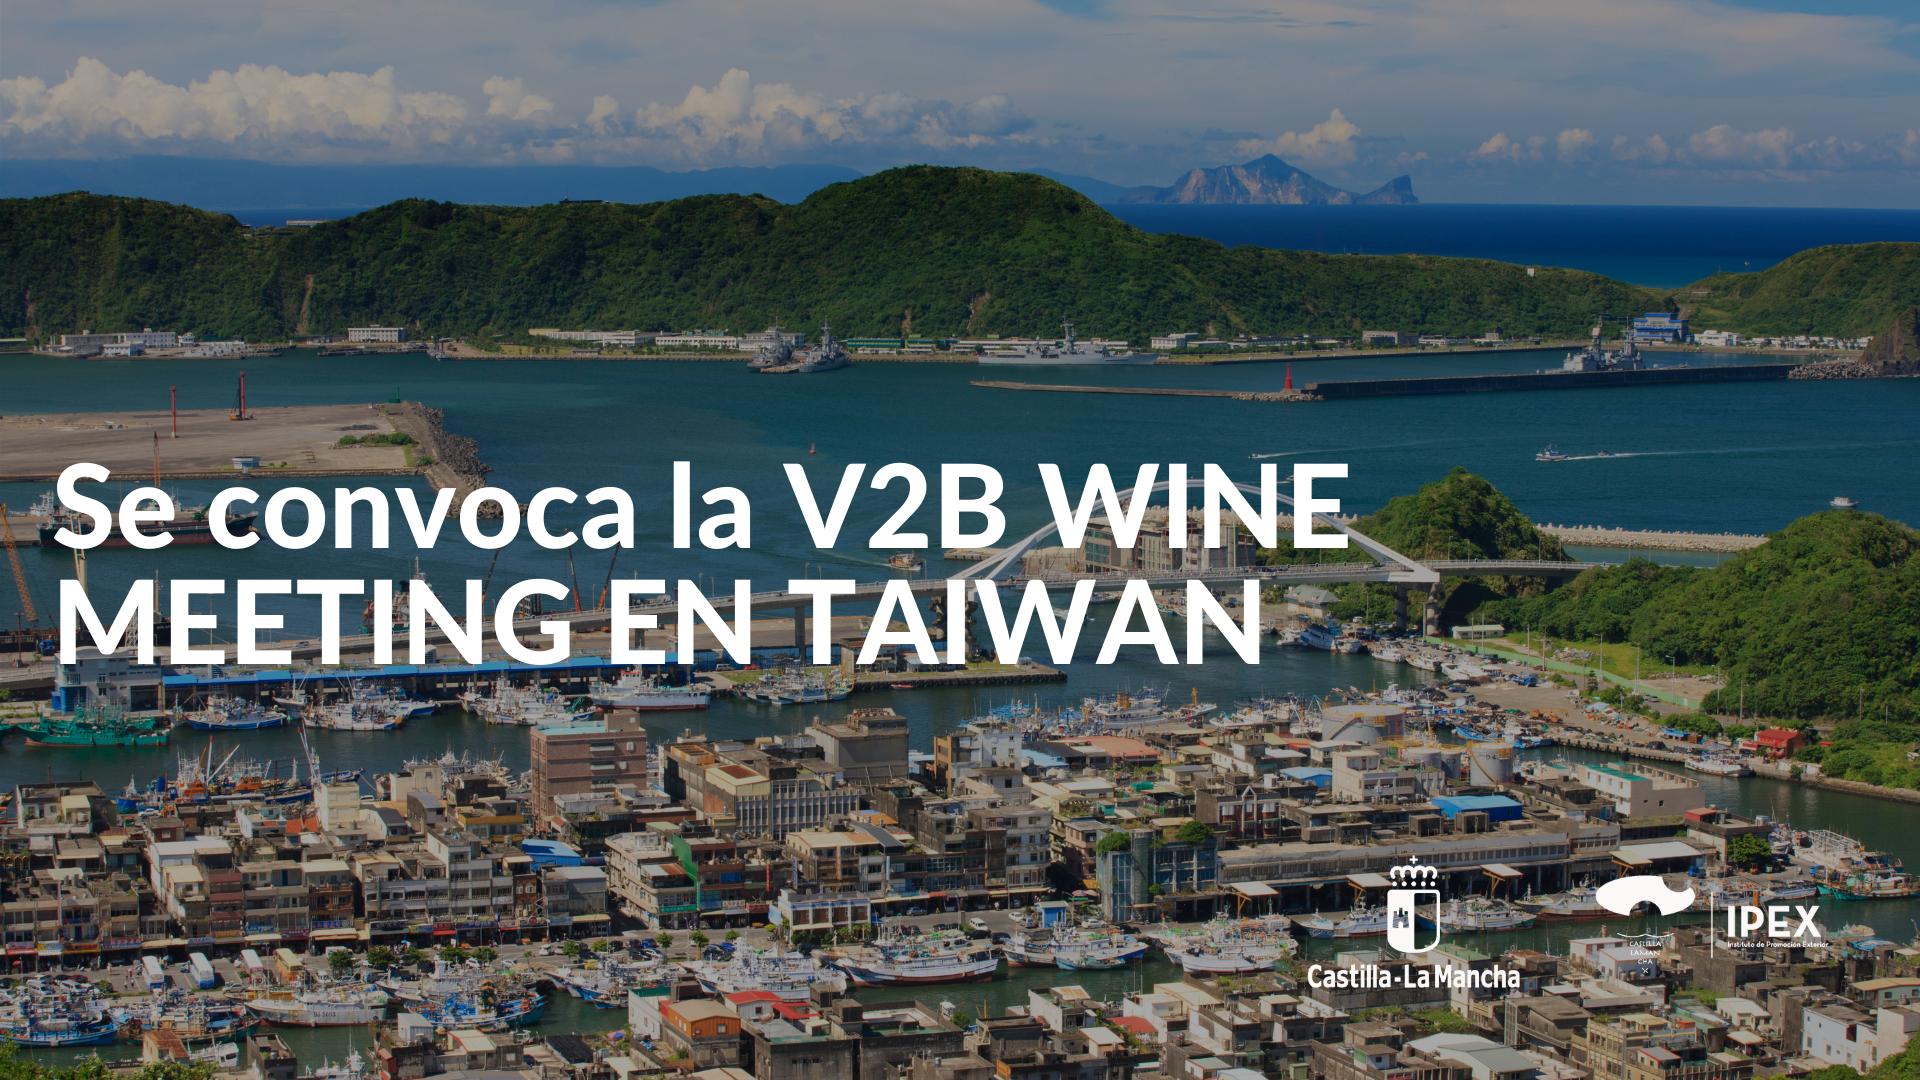 V2B WINE MEETING EN TAIWÁN